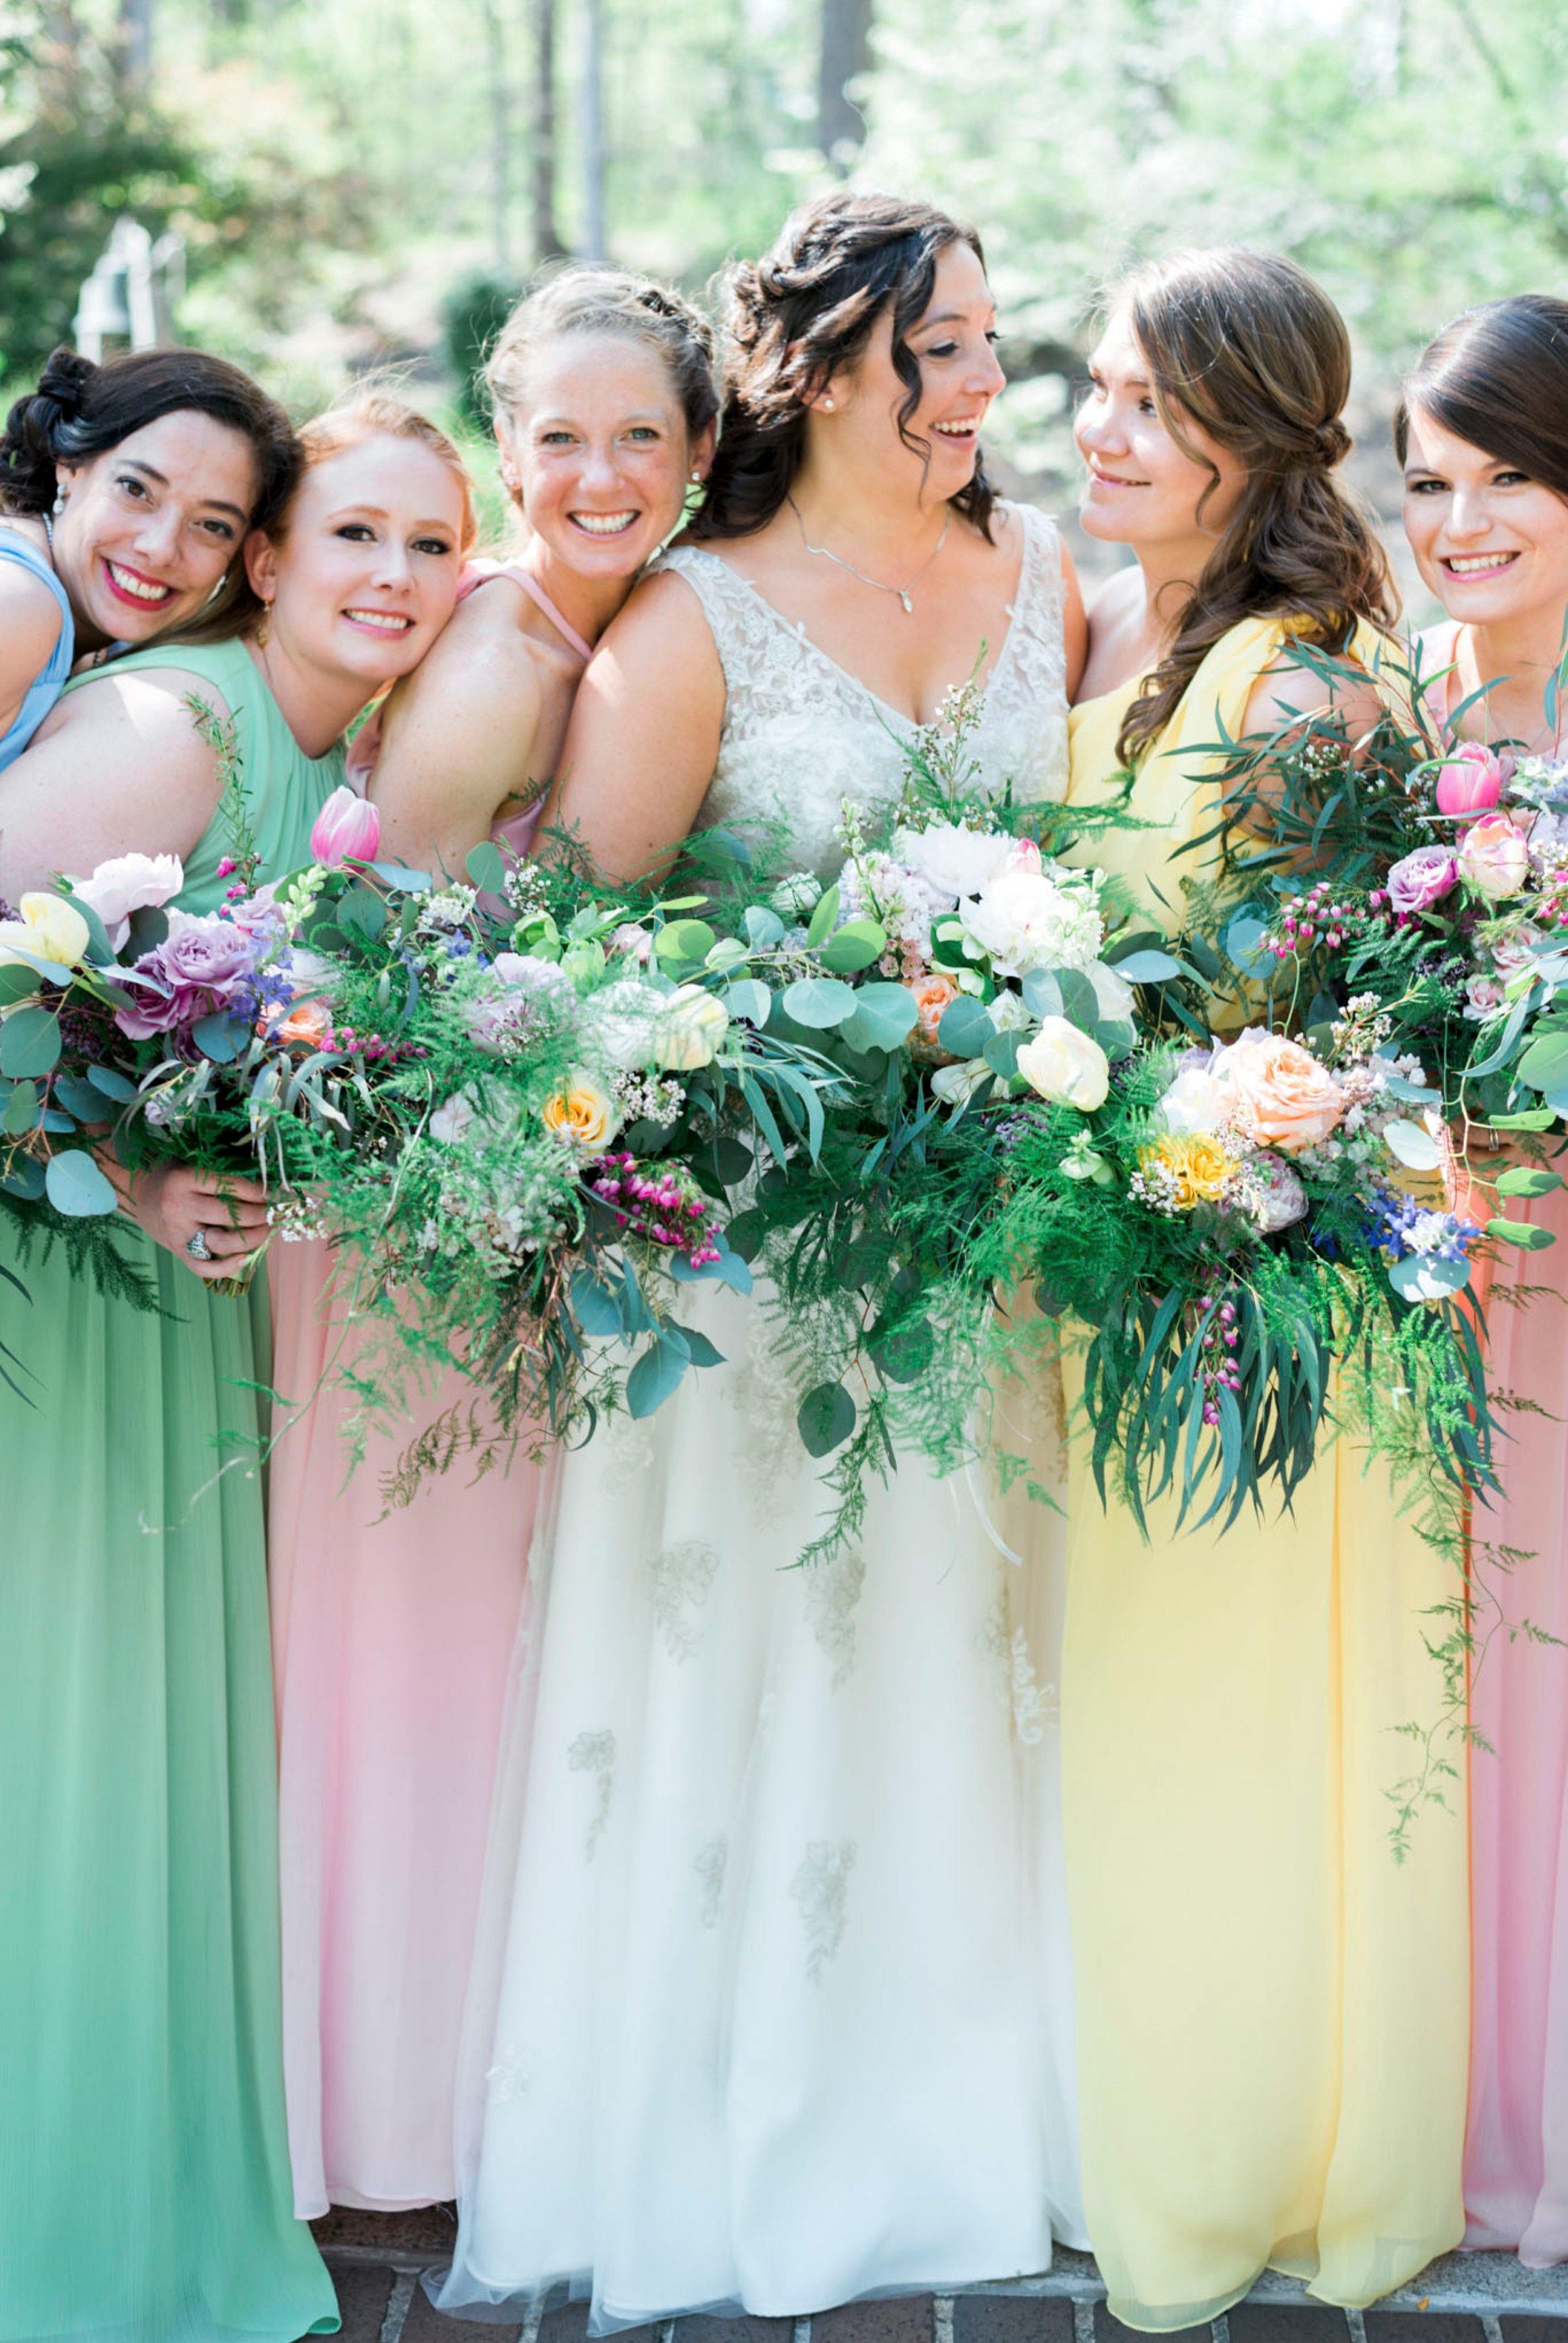 TheVirginianHotel_LynchburgVA_TheVirginianHotelWedding_Virginiaweddingphotographer_Lynchburgvawedding 38.jpg